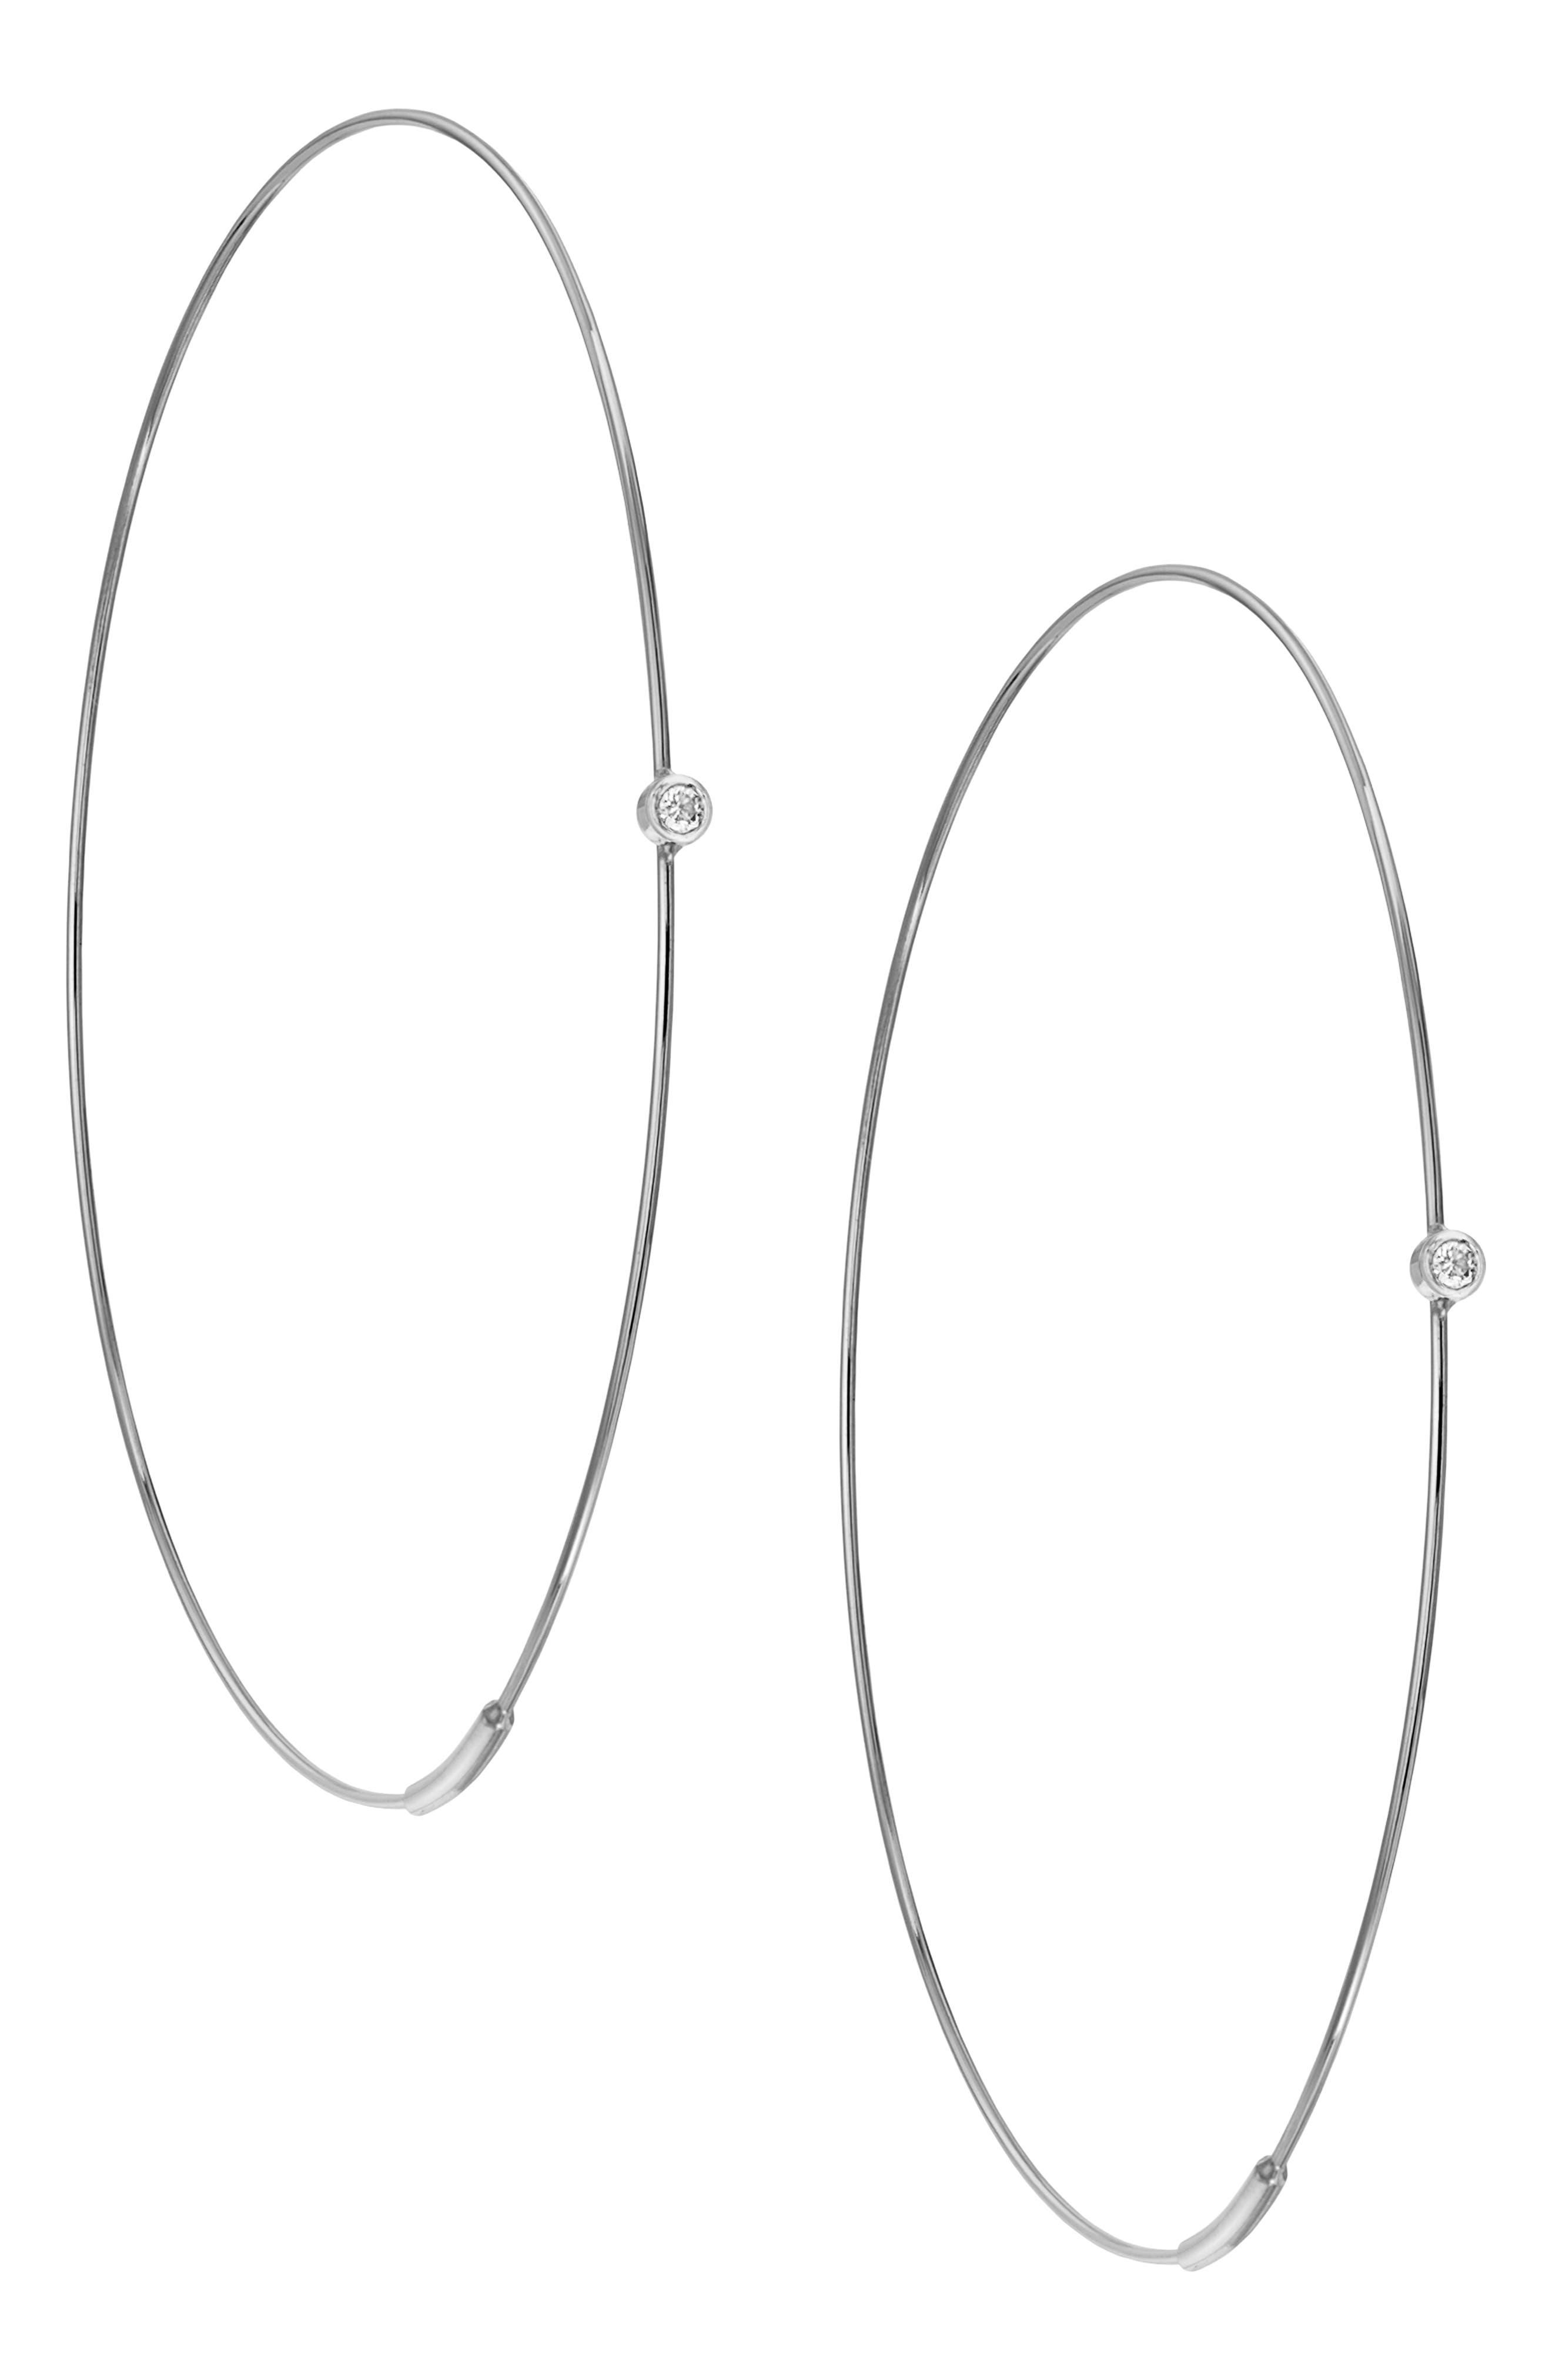 LANA JEWELRY LARGE MAGIC HOOP DIAMOND EARRINGS